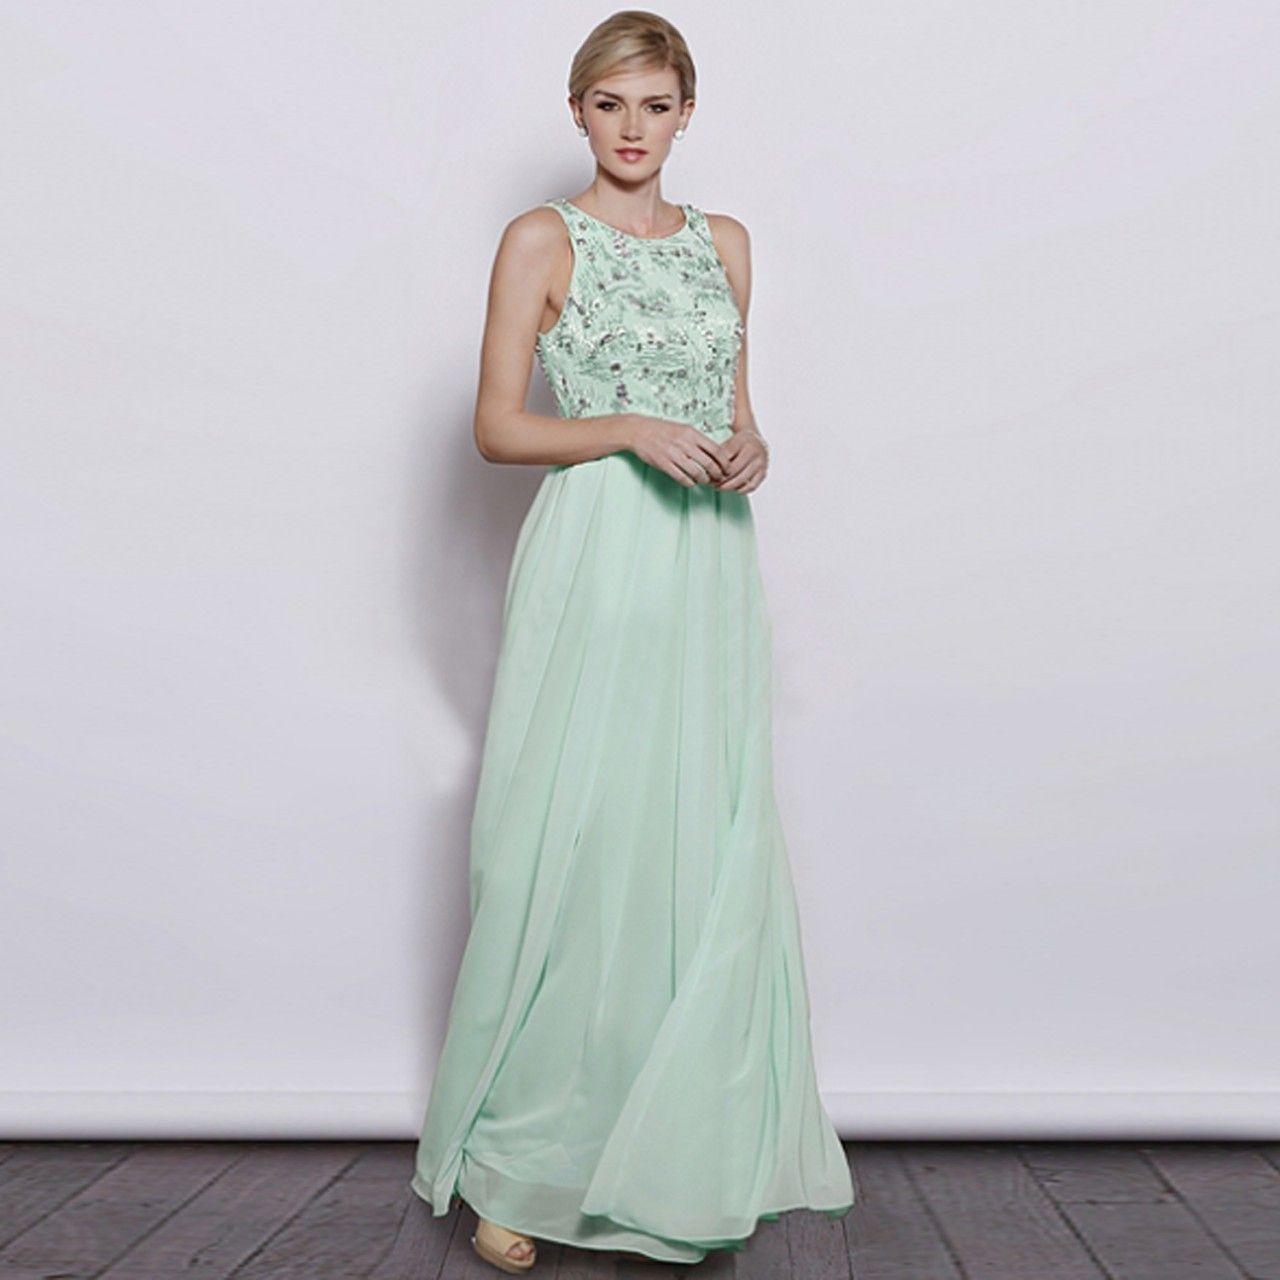 Fashionably Yours - Ingrid Dress Mint, $199.00 (http://fashionably ...